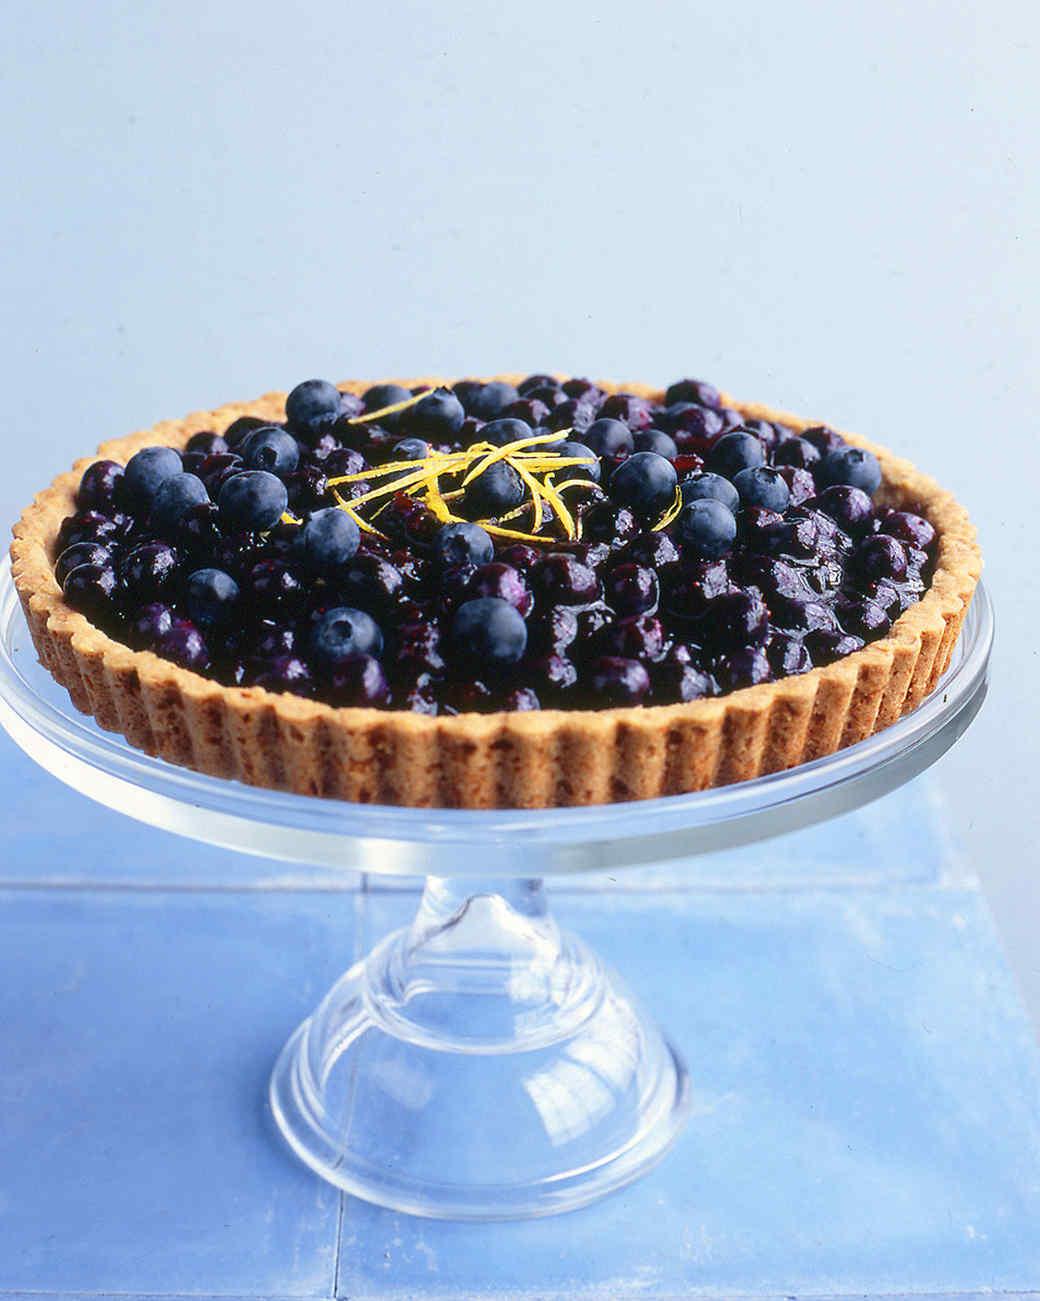 images Blueberry Tart